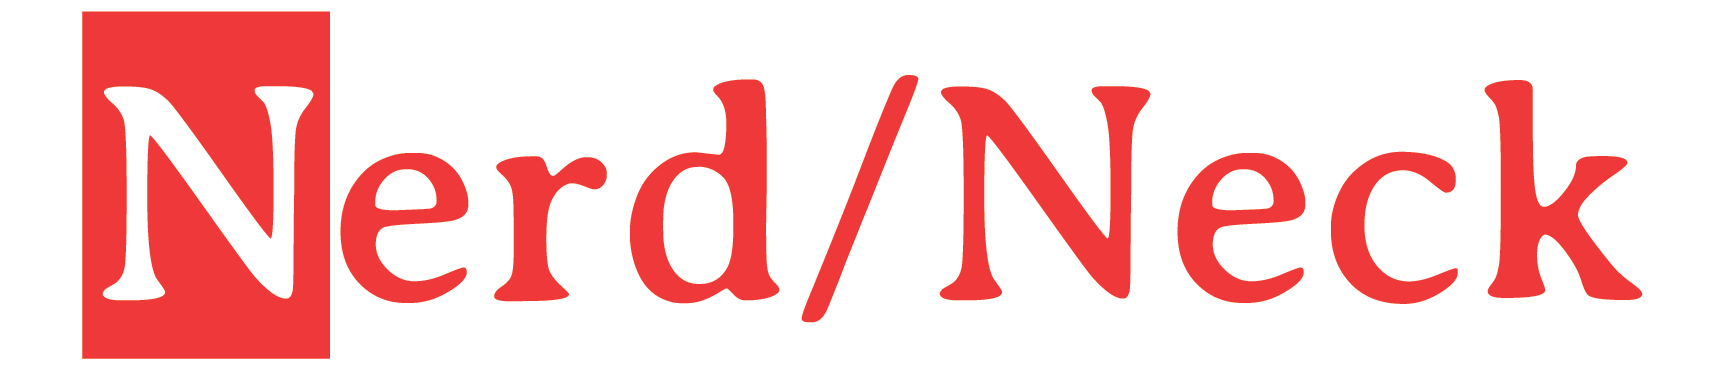 NERD/NECK